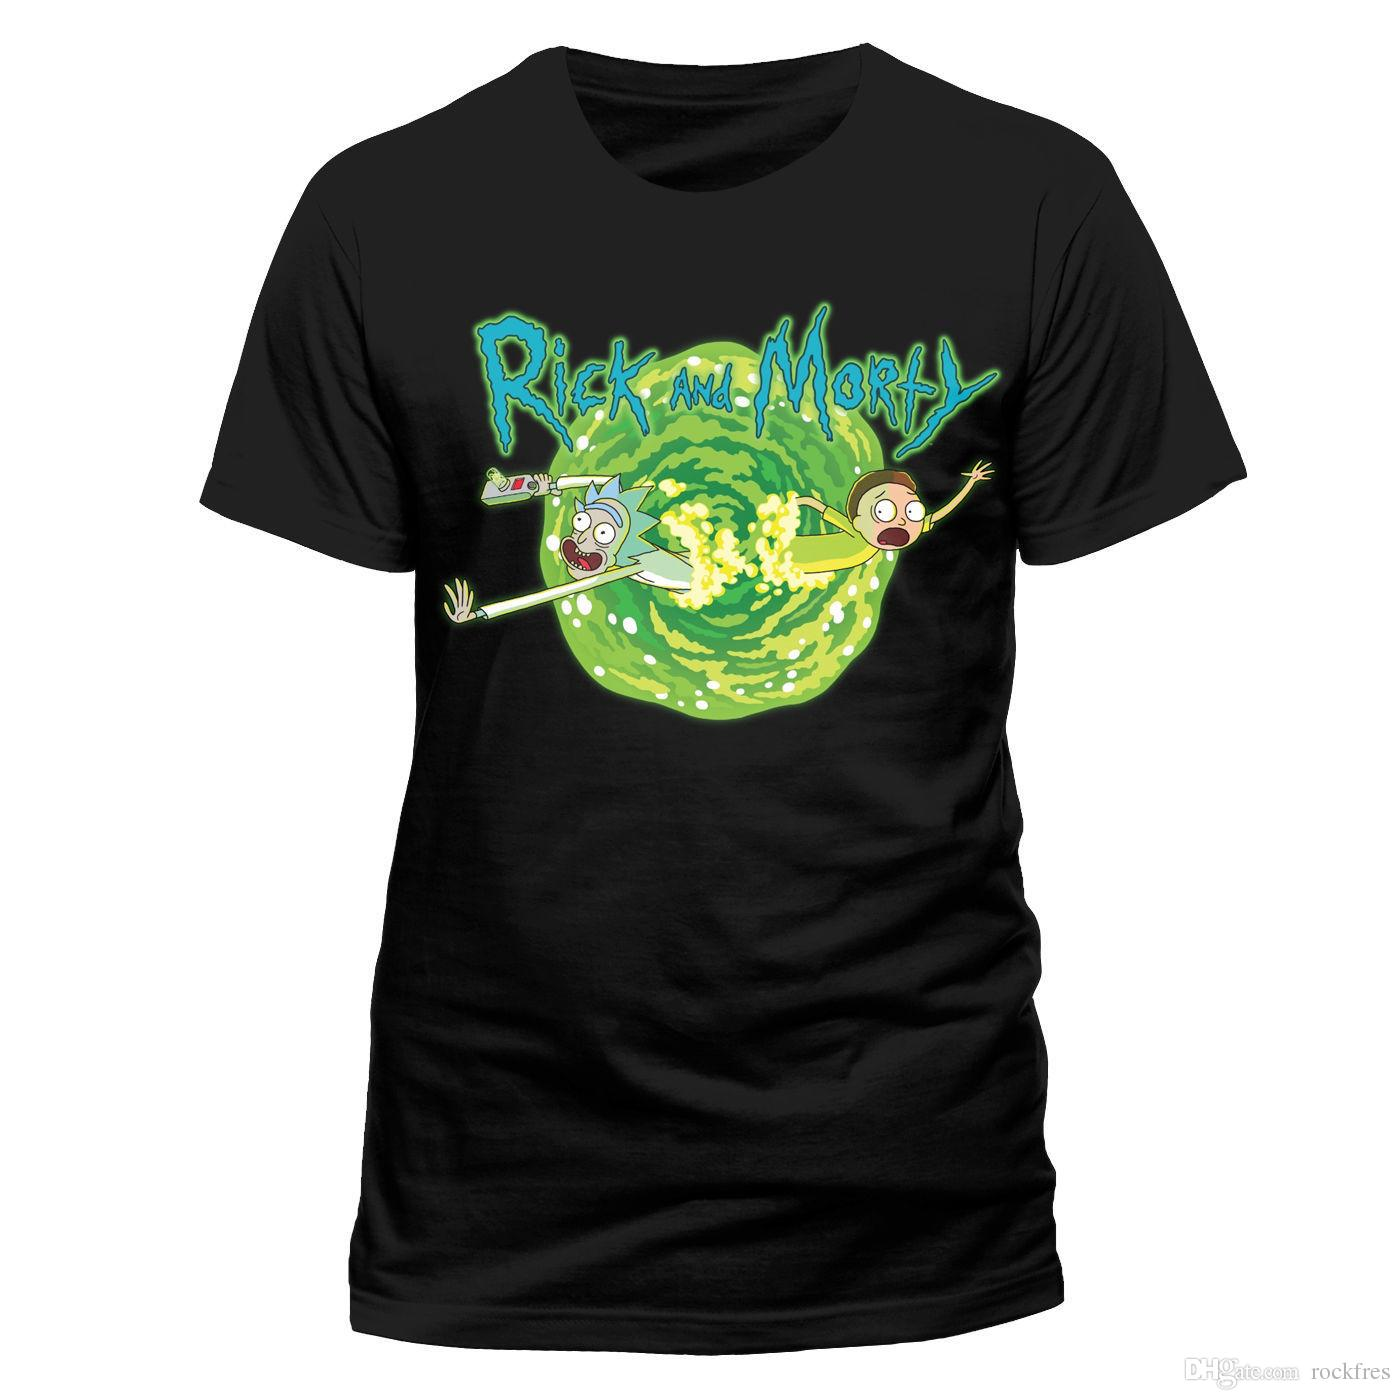 b0a6a5728 Rick Y Morty Mens Negro Portal Camiseta Oficial Gun Adult Swim Cartoon  Network Shirt Tees T Shirt On Shirt From Rockfres